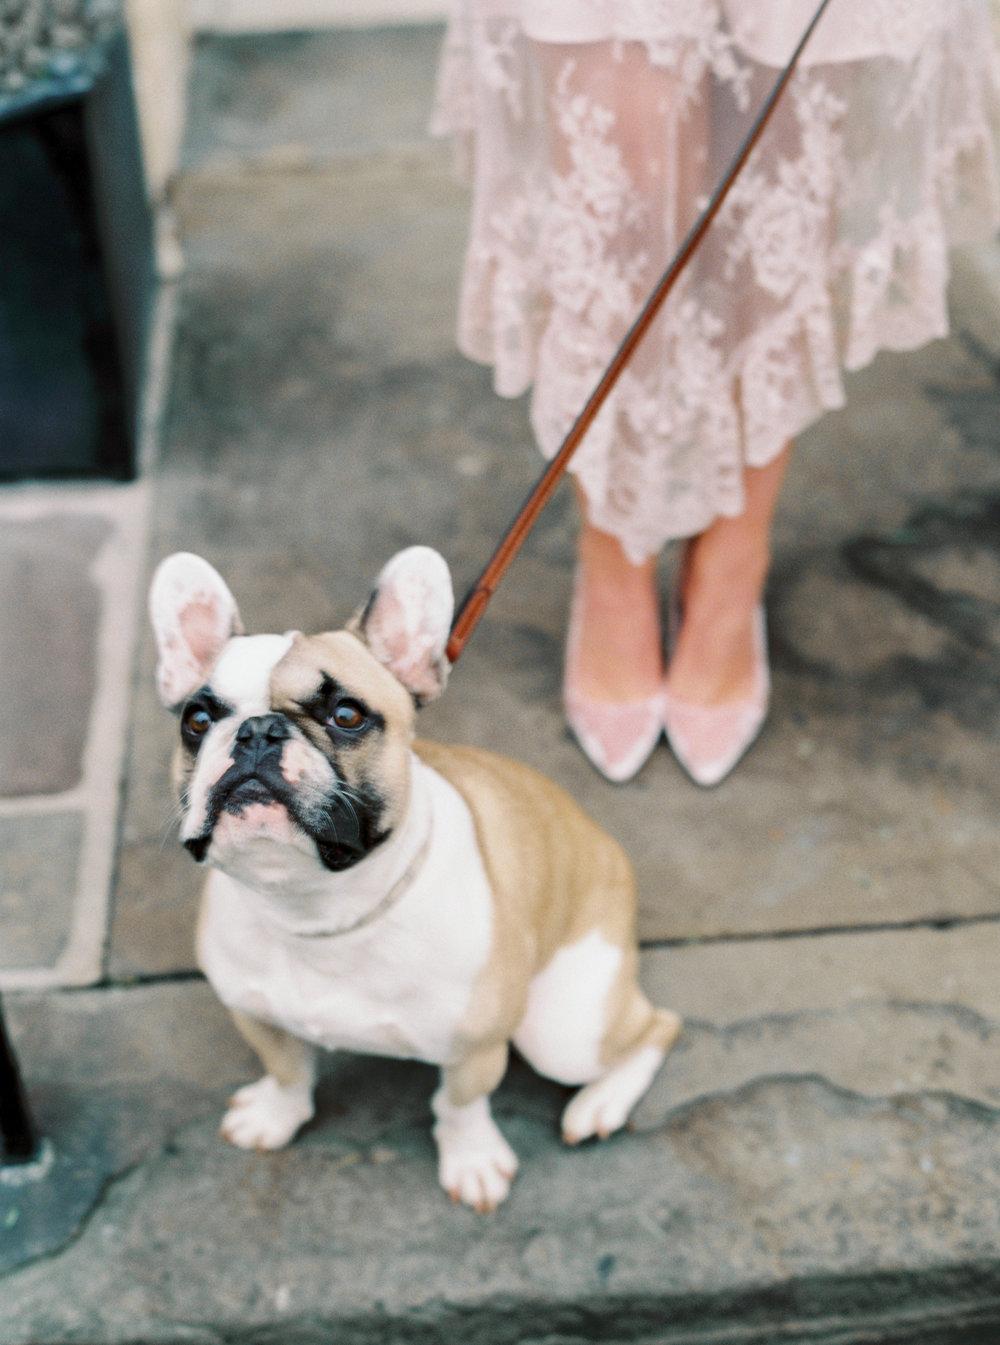 Luxury Wedding Planner UK | Our Chic & Romantic Engagement Shoot in Bath | Katie Julia Photography - 36.JPG